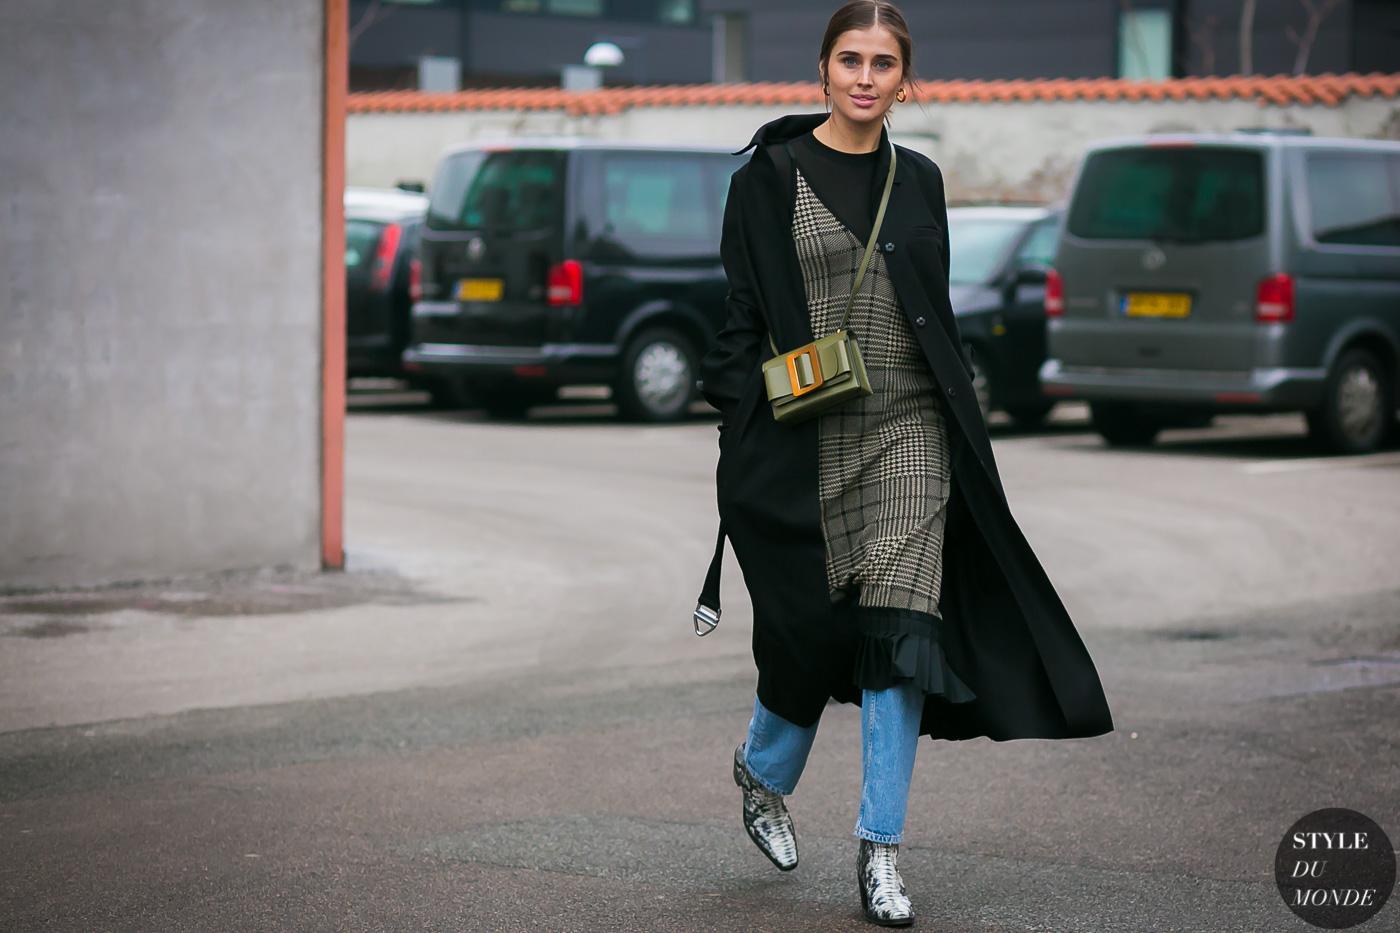 Darja Barannik Cph fw17 day1 by STYLEDUMONDE Street Style Fashion Photography0E2A7190